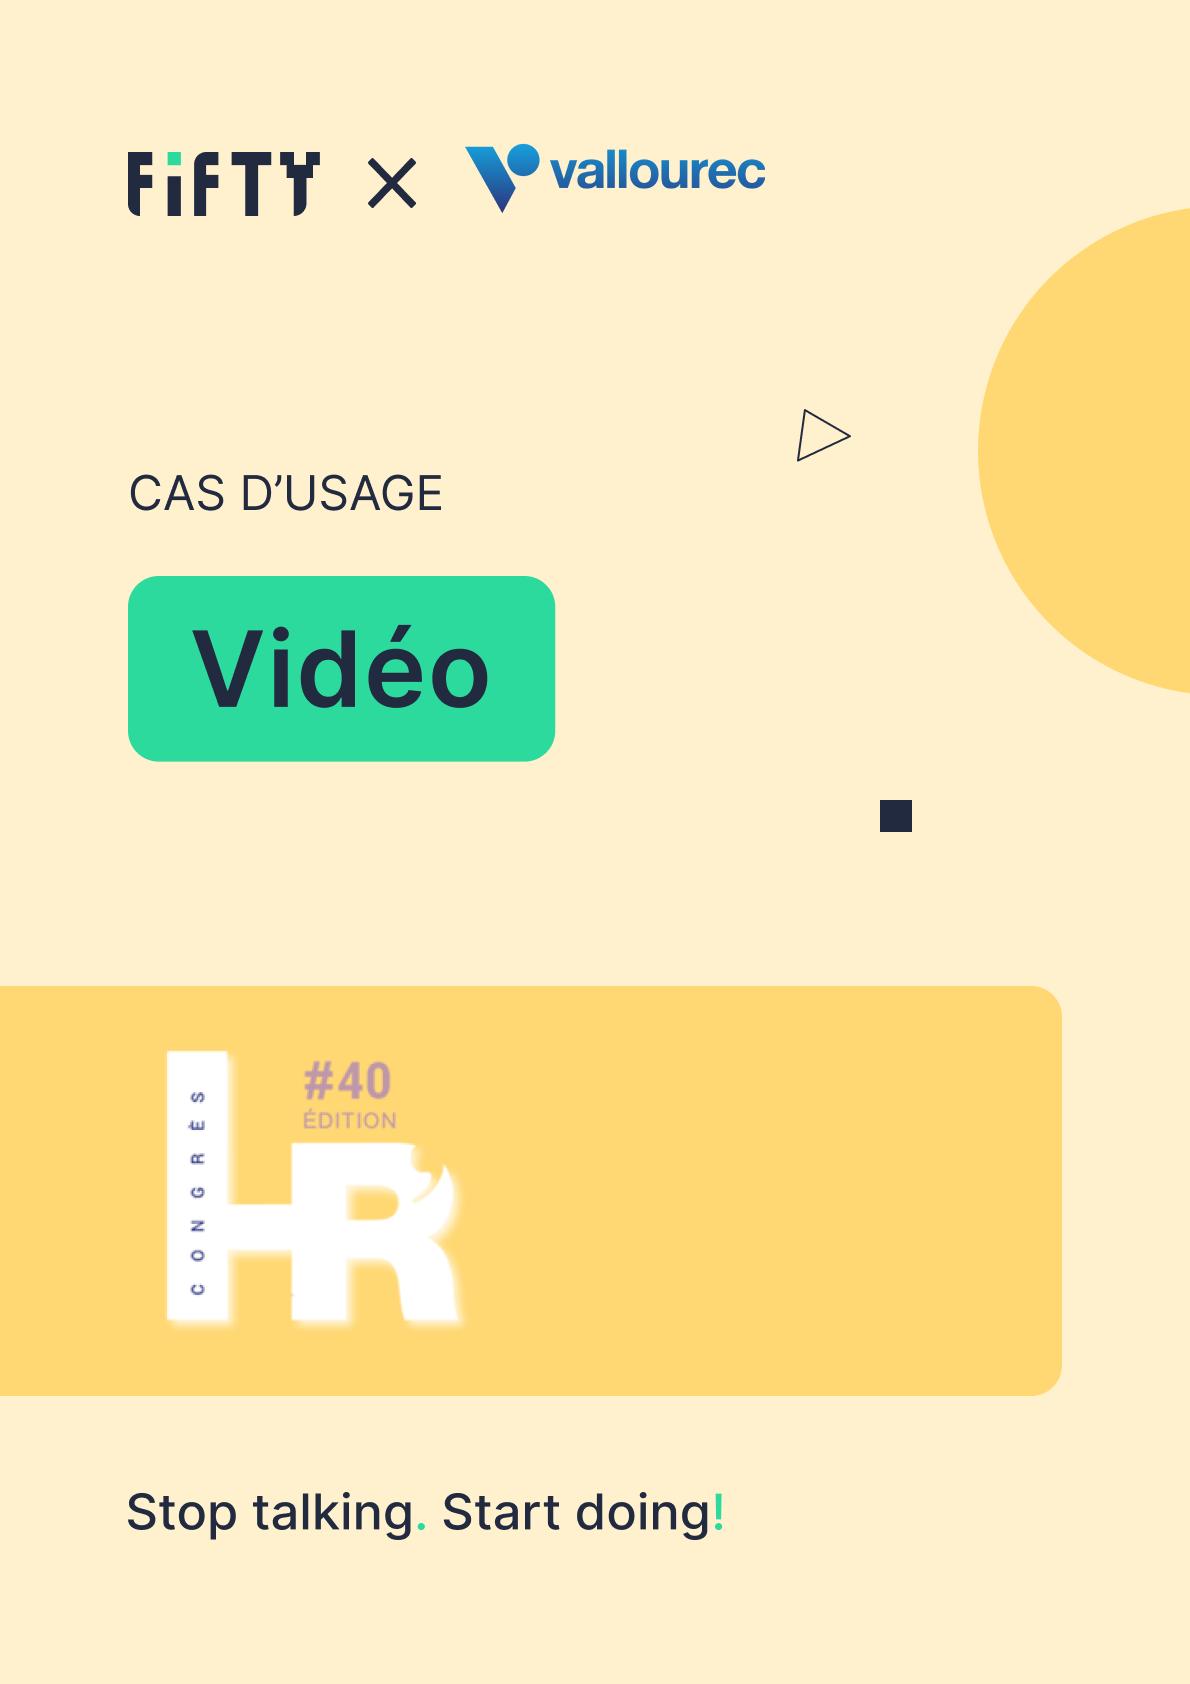 Use case: Vallourec